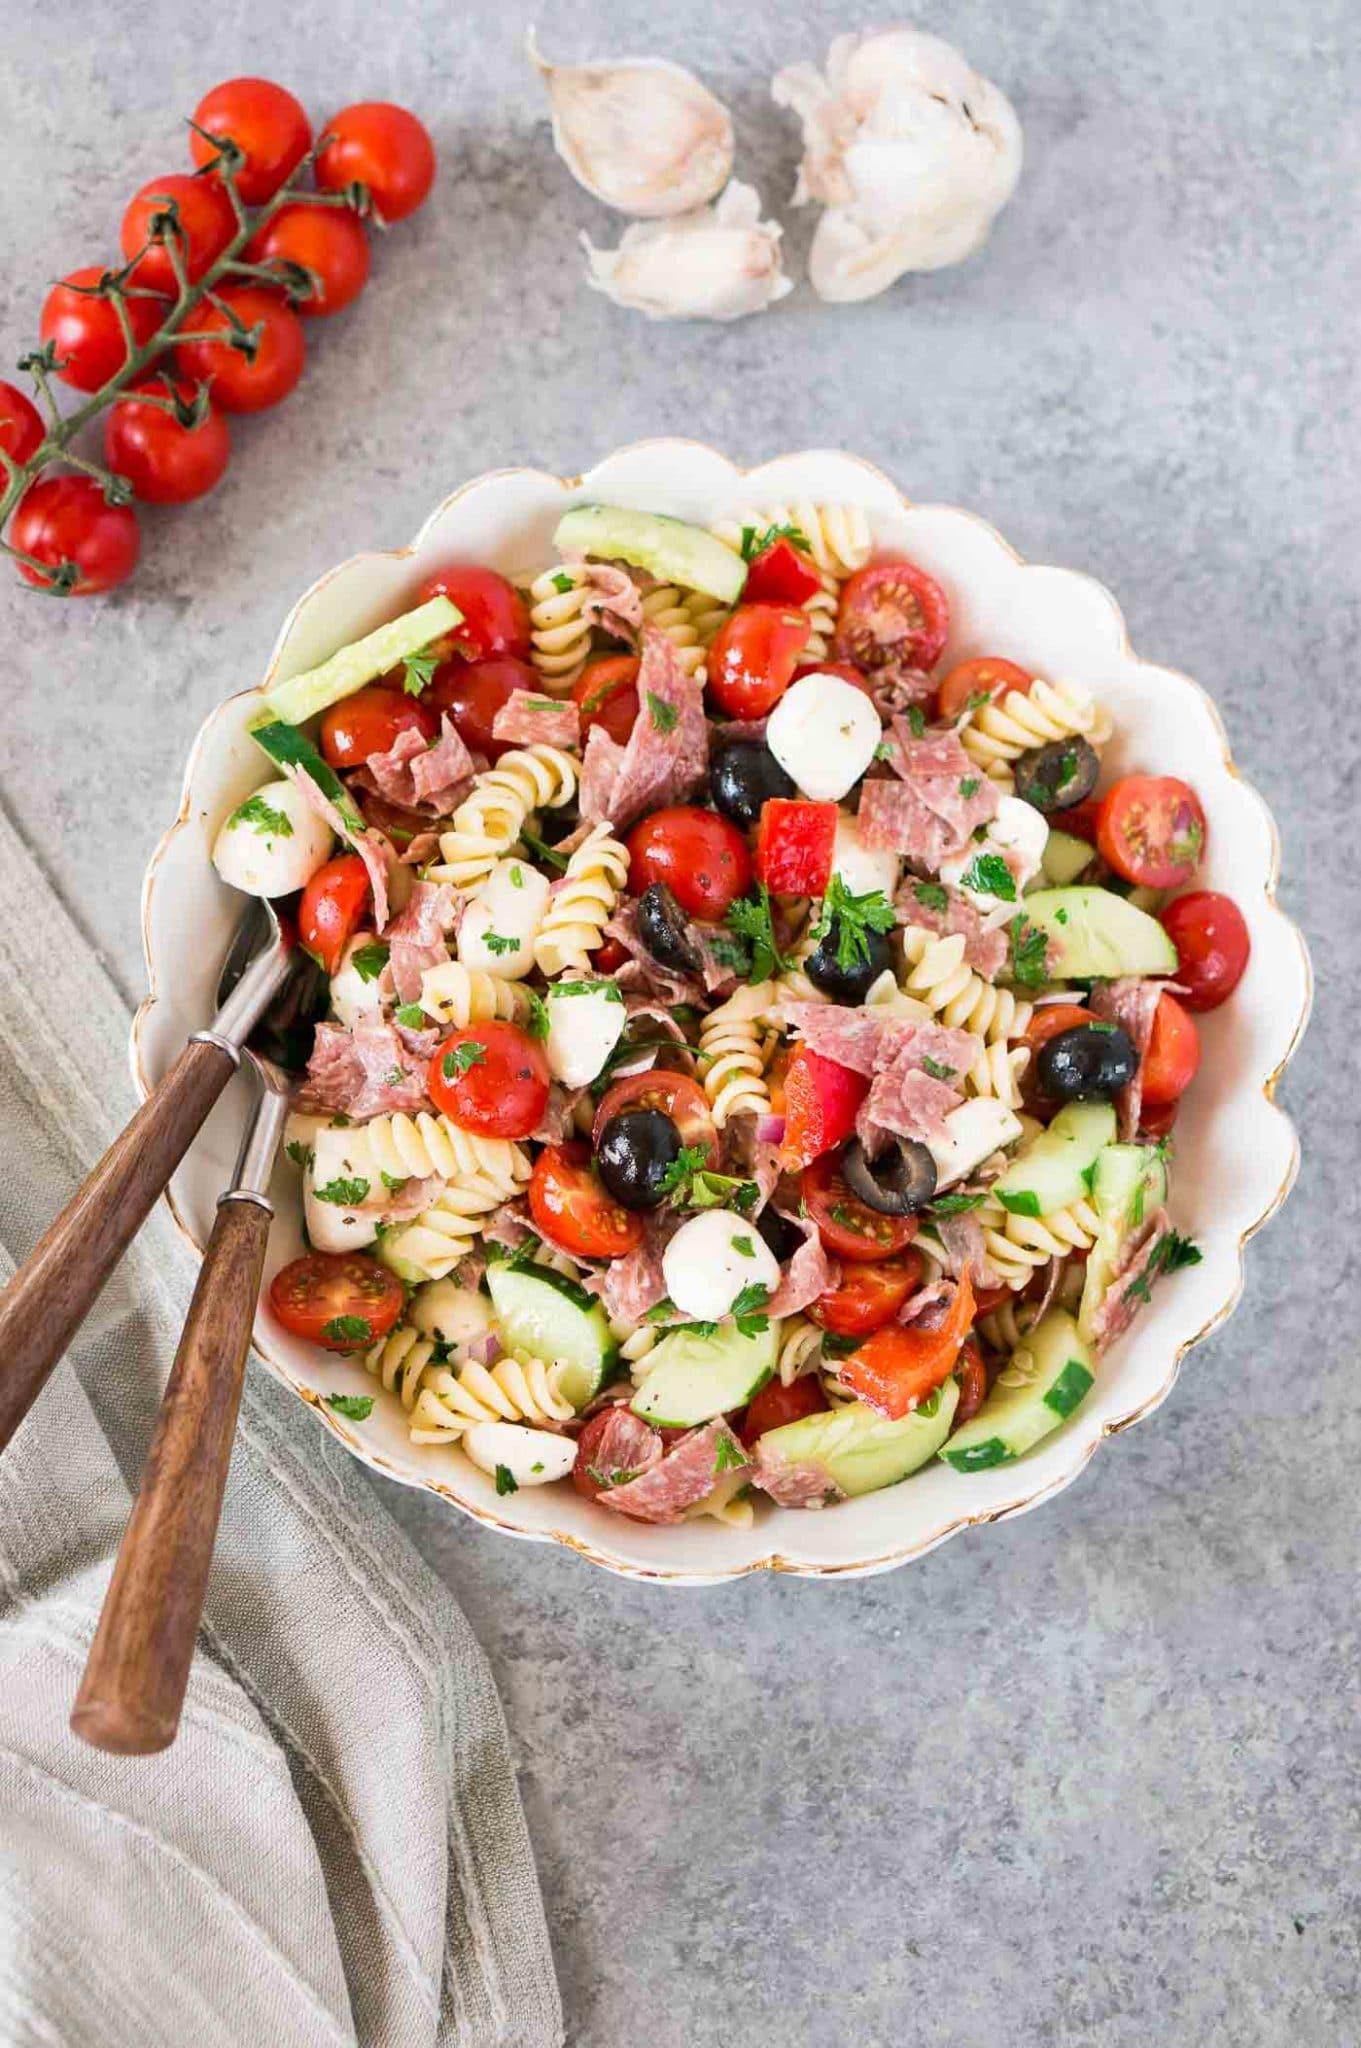 Italian pasta salad with Italian dressing